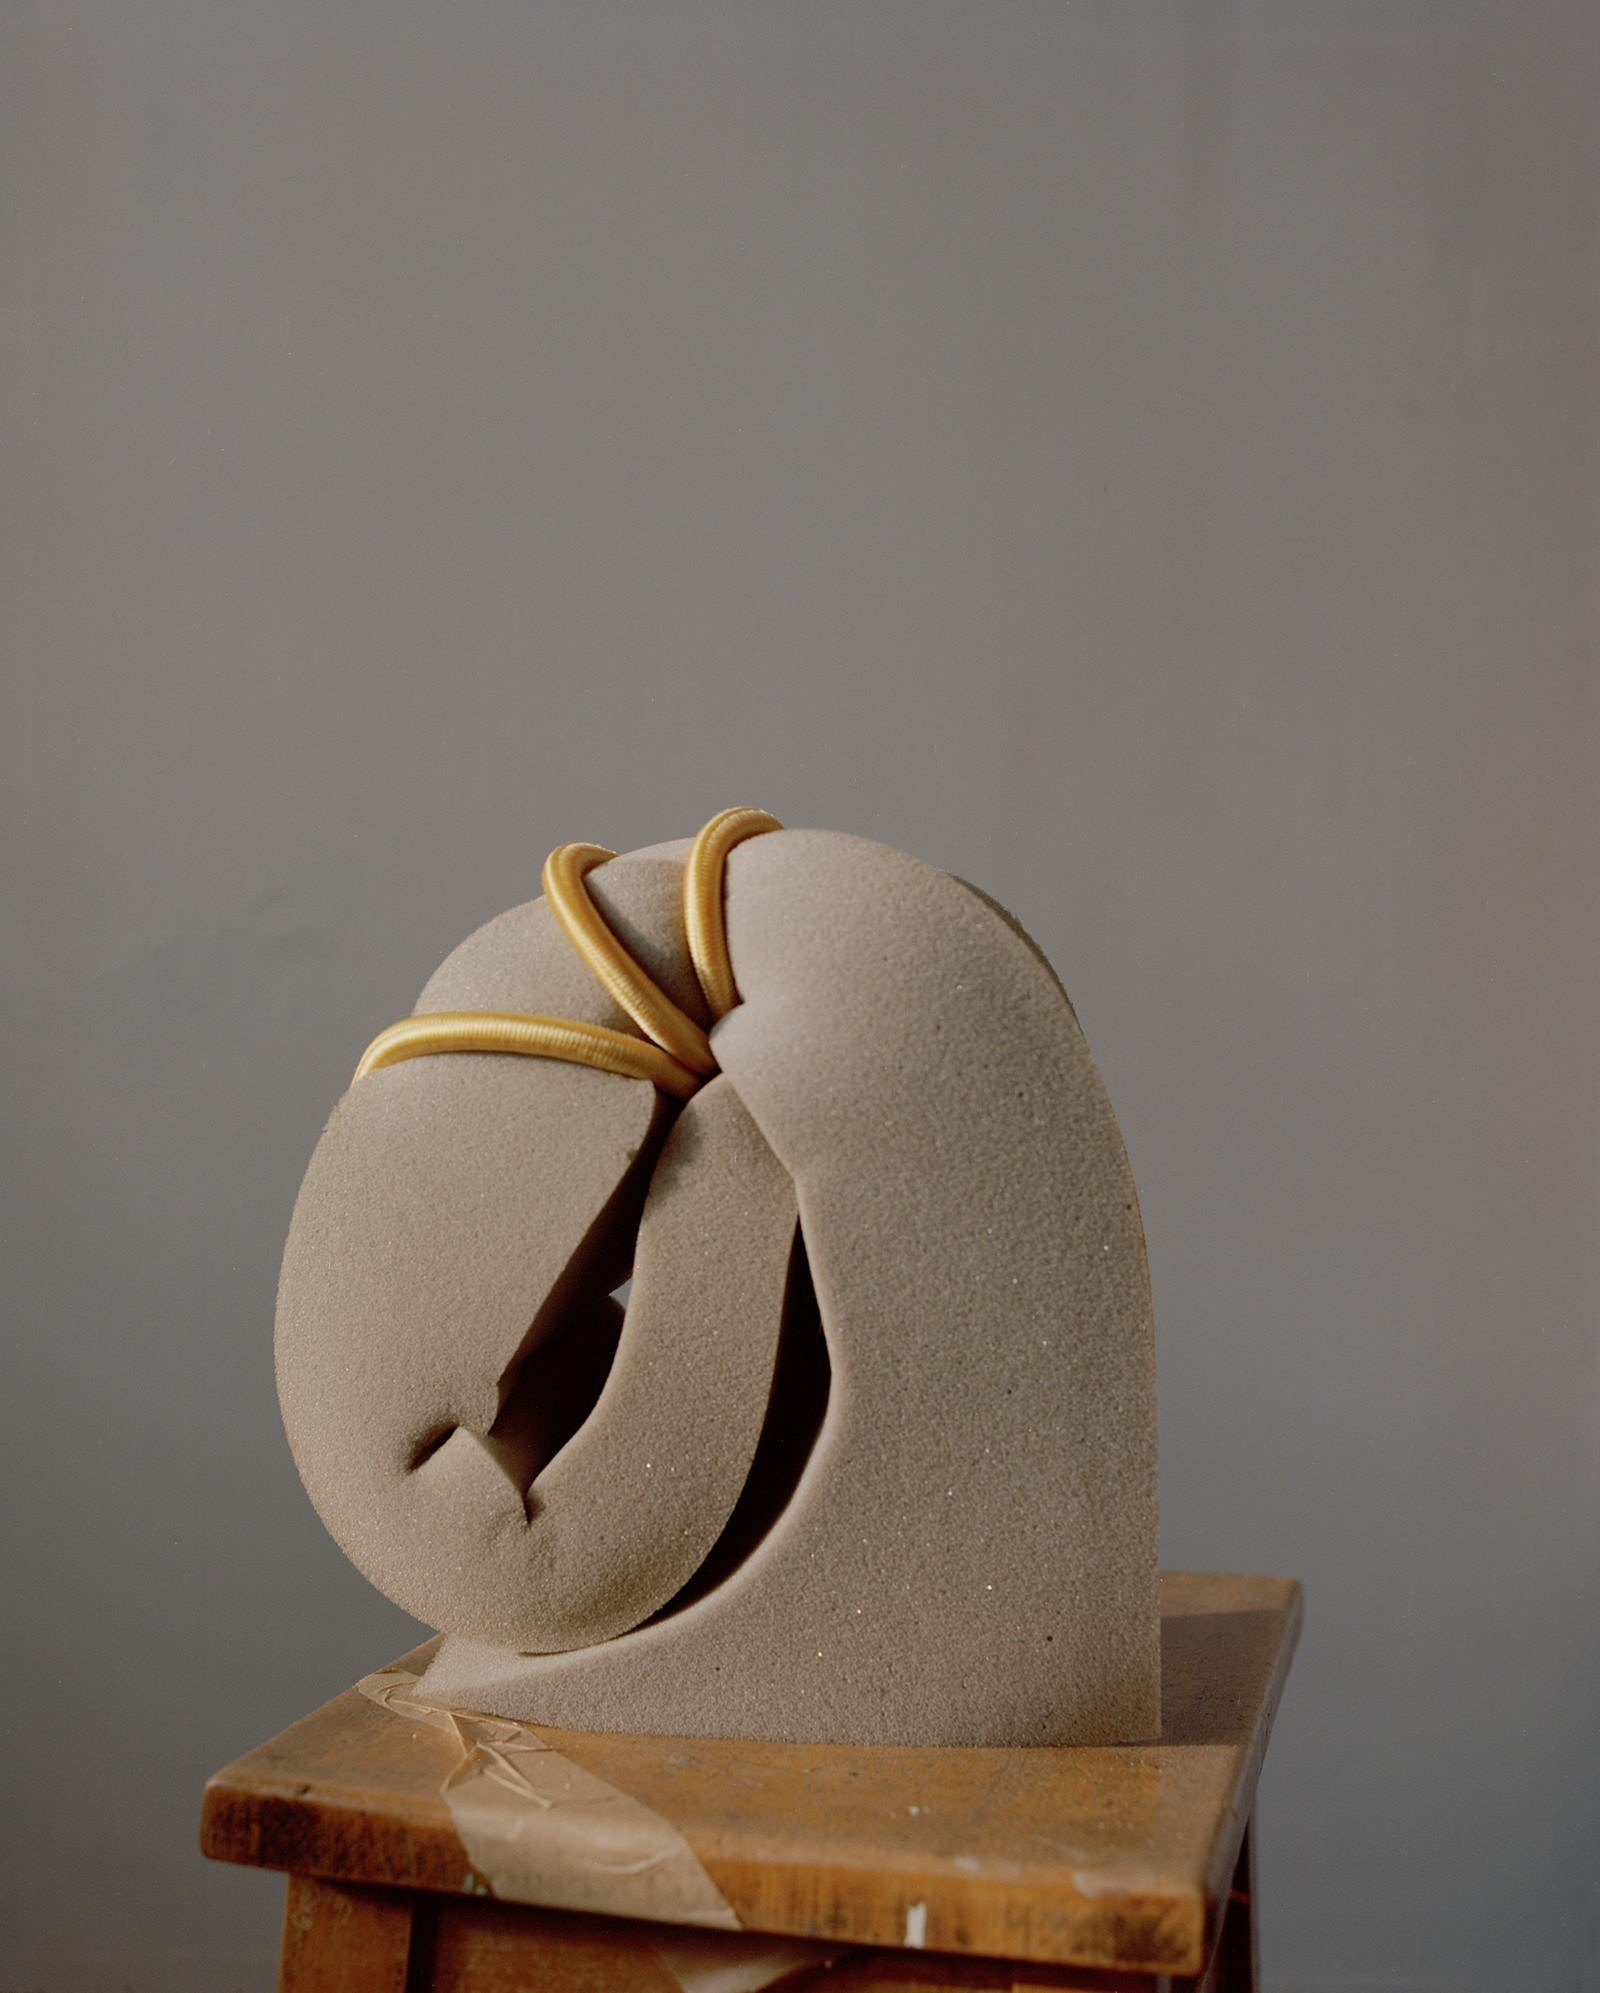 IGNANT-Art-Tine-Bek-Komfort-Skulptur-6